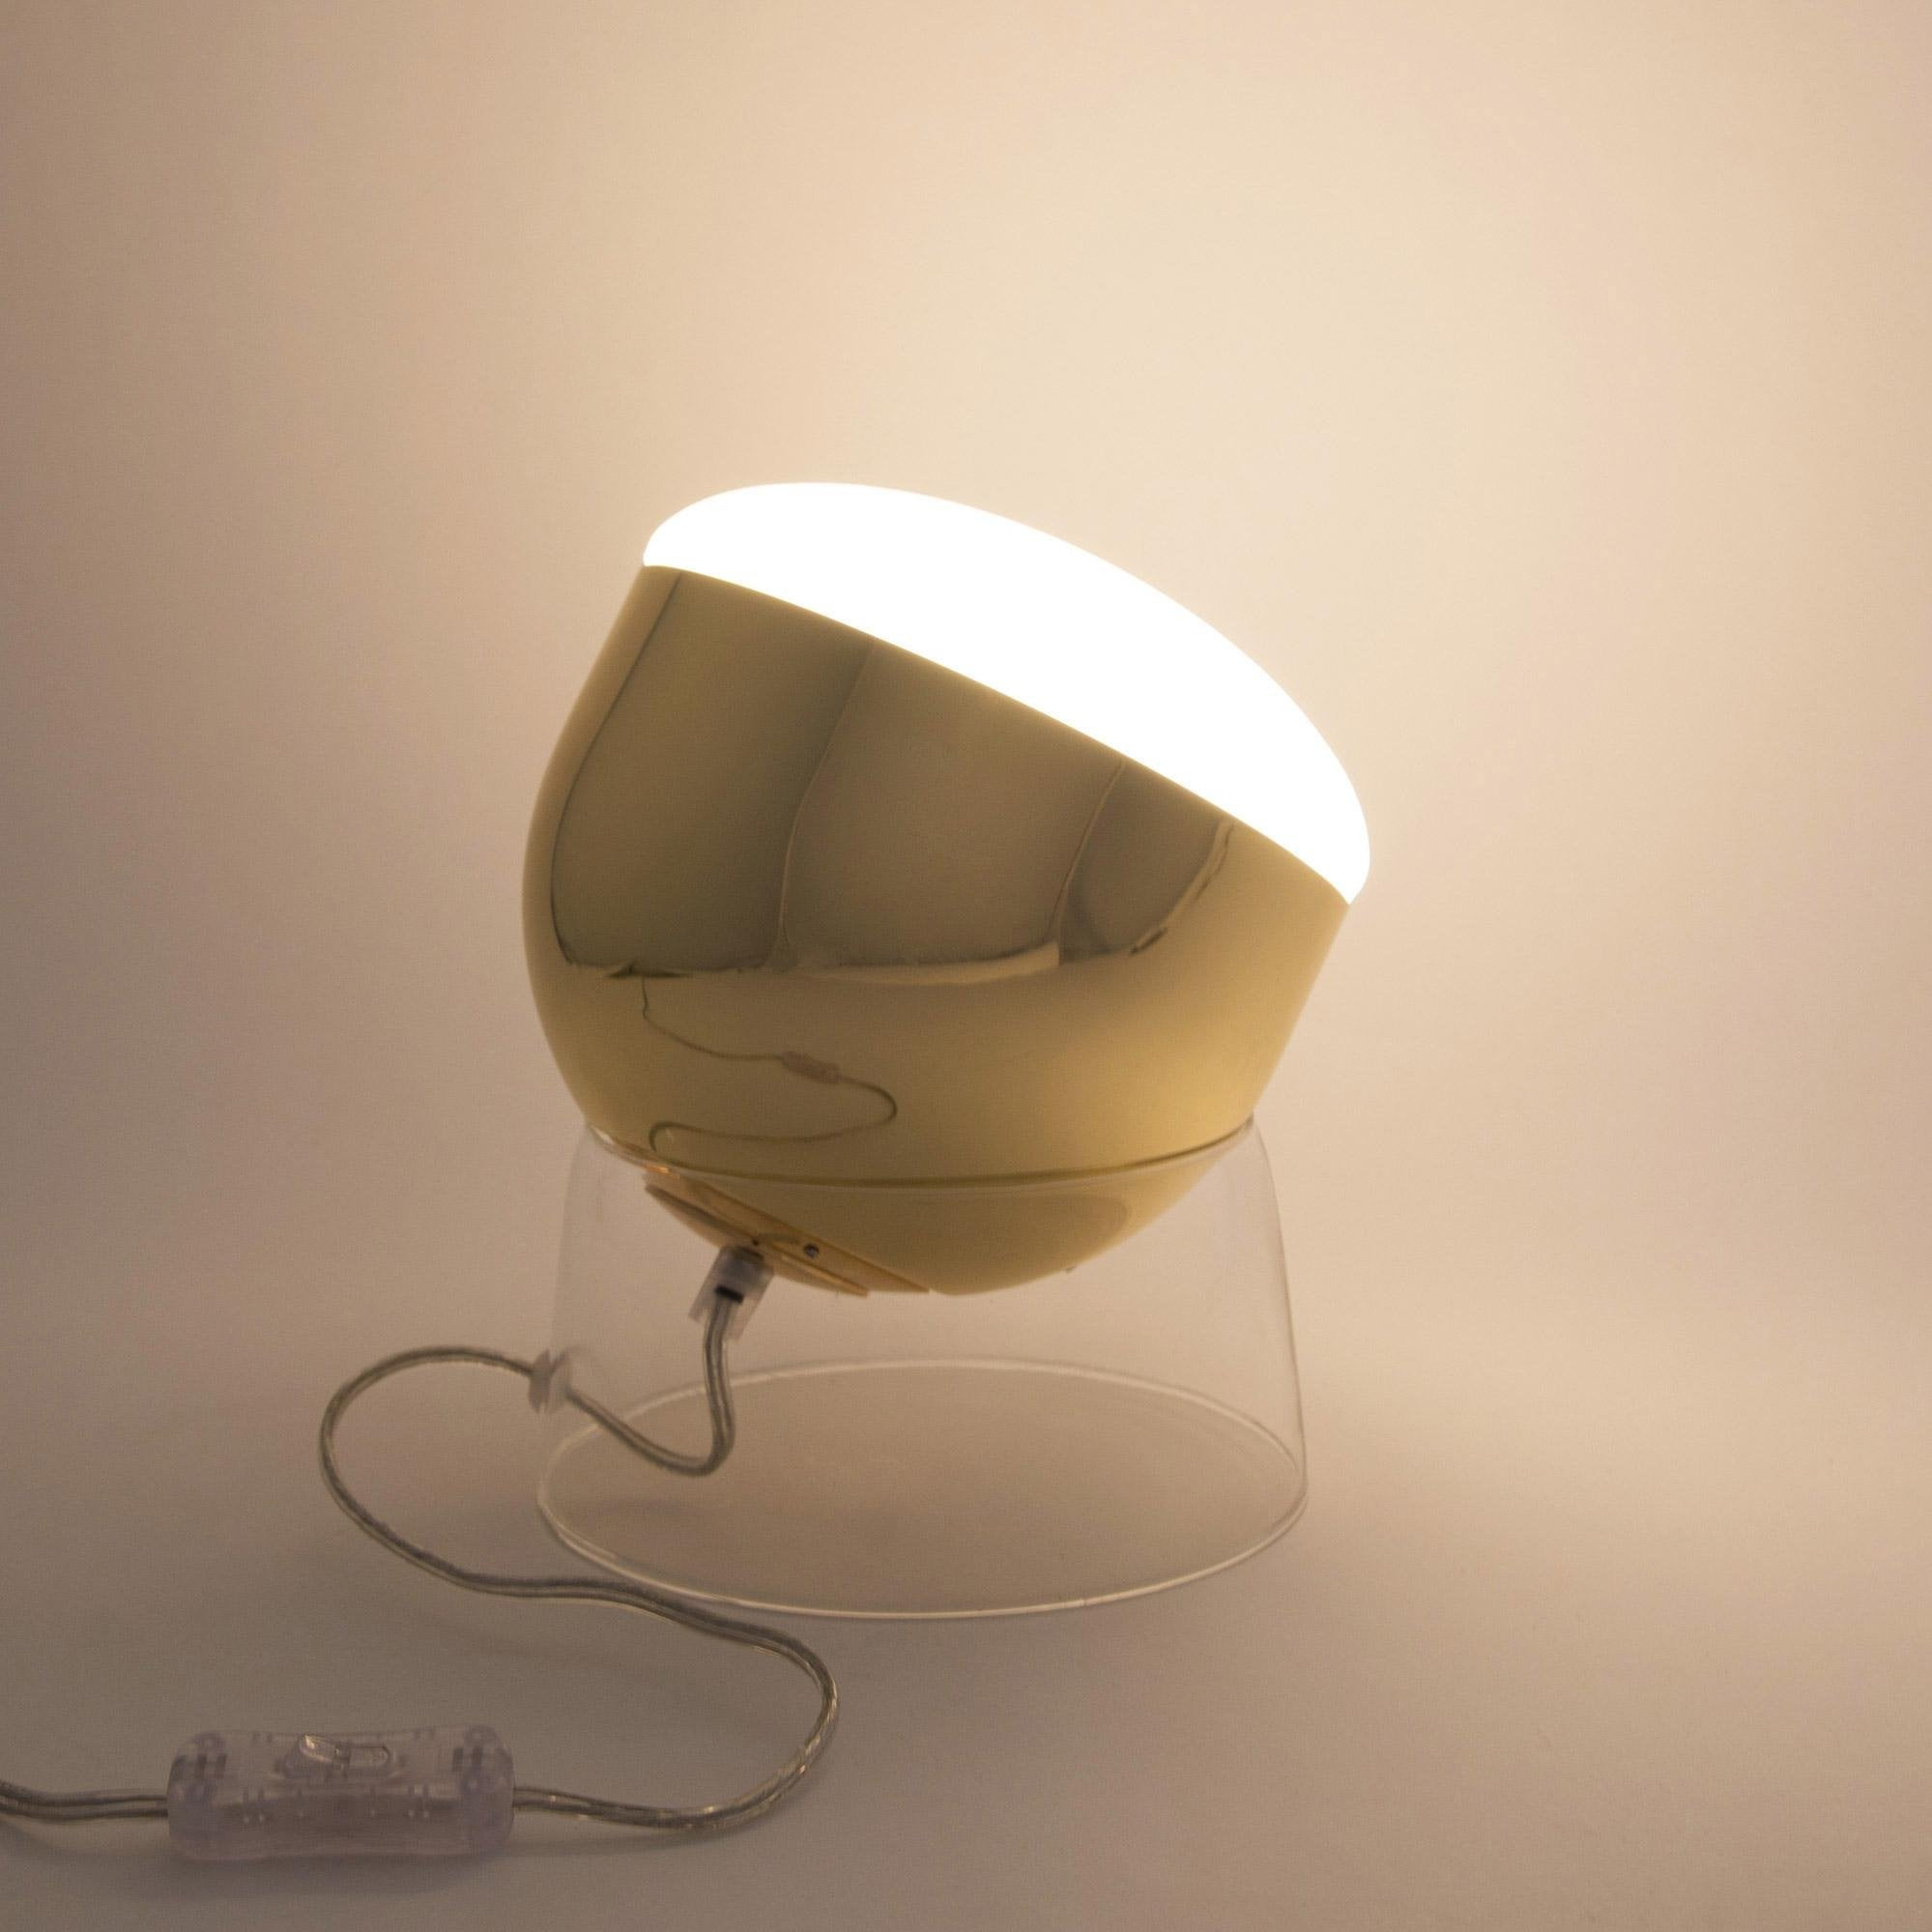 Lampe, design, métal laiton Glossy